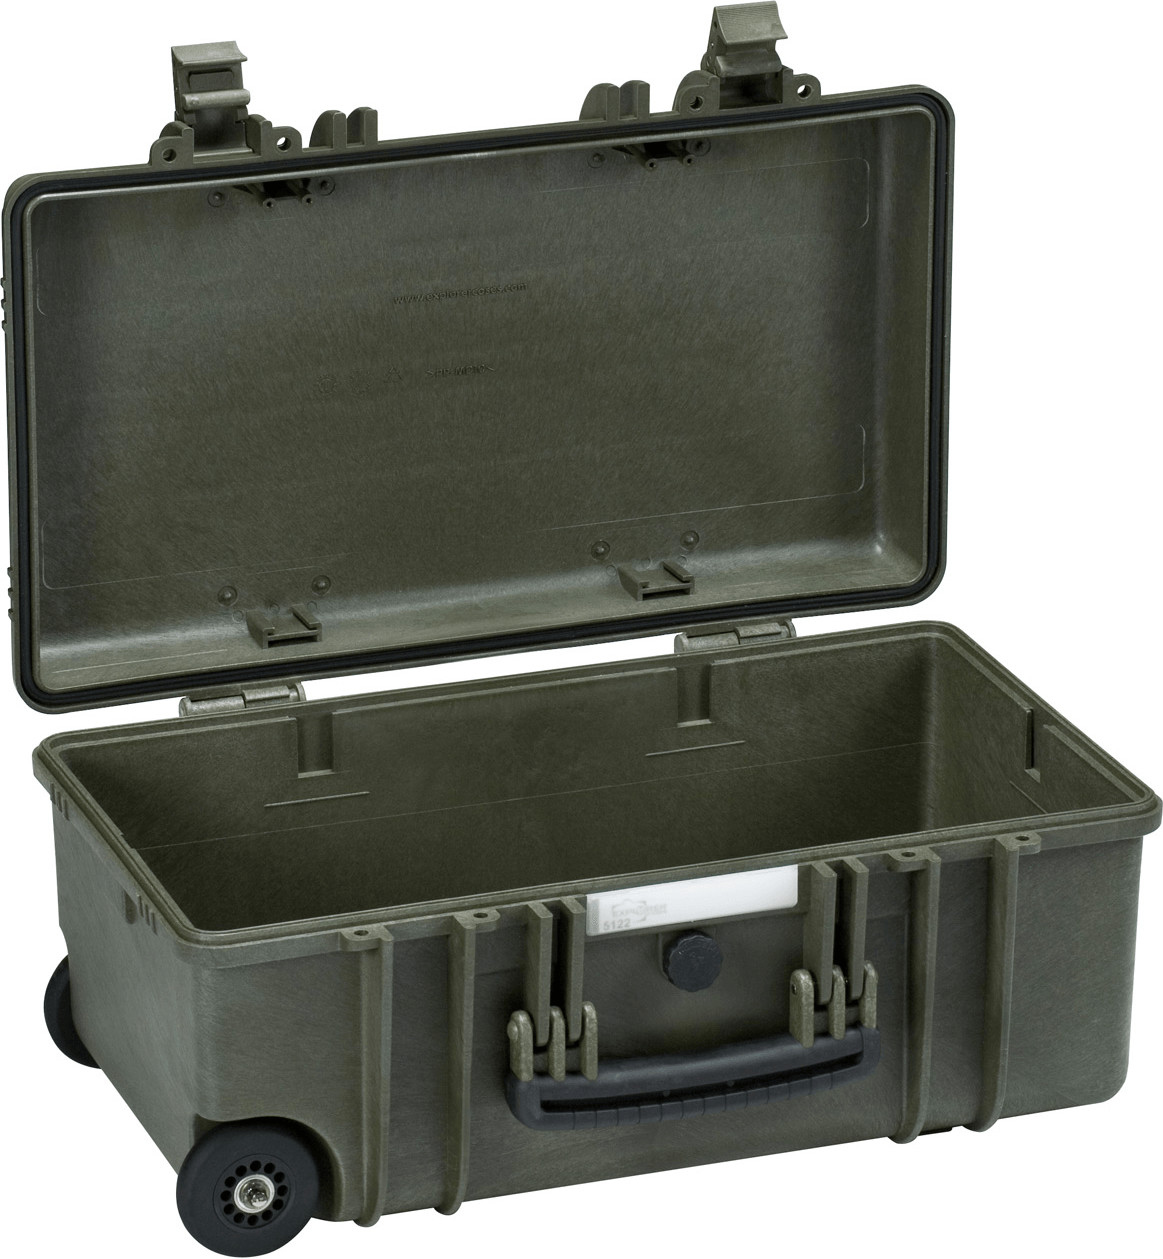 Image of Explorer Cases 5122 GE